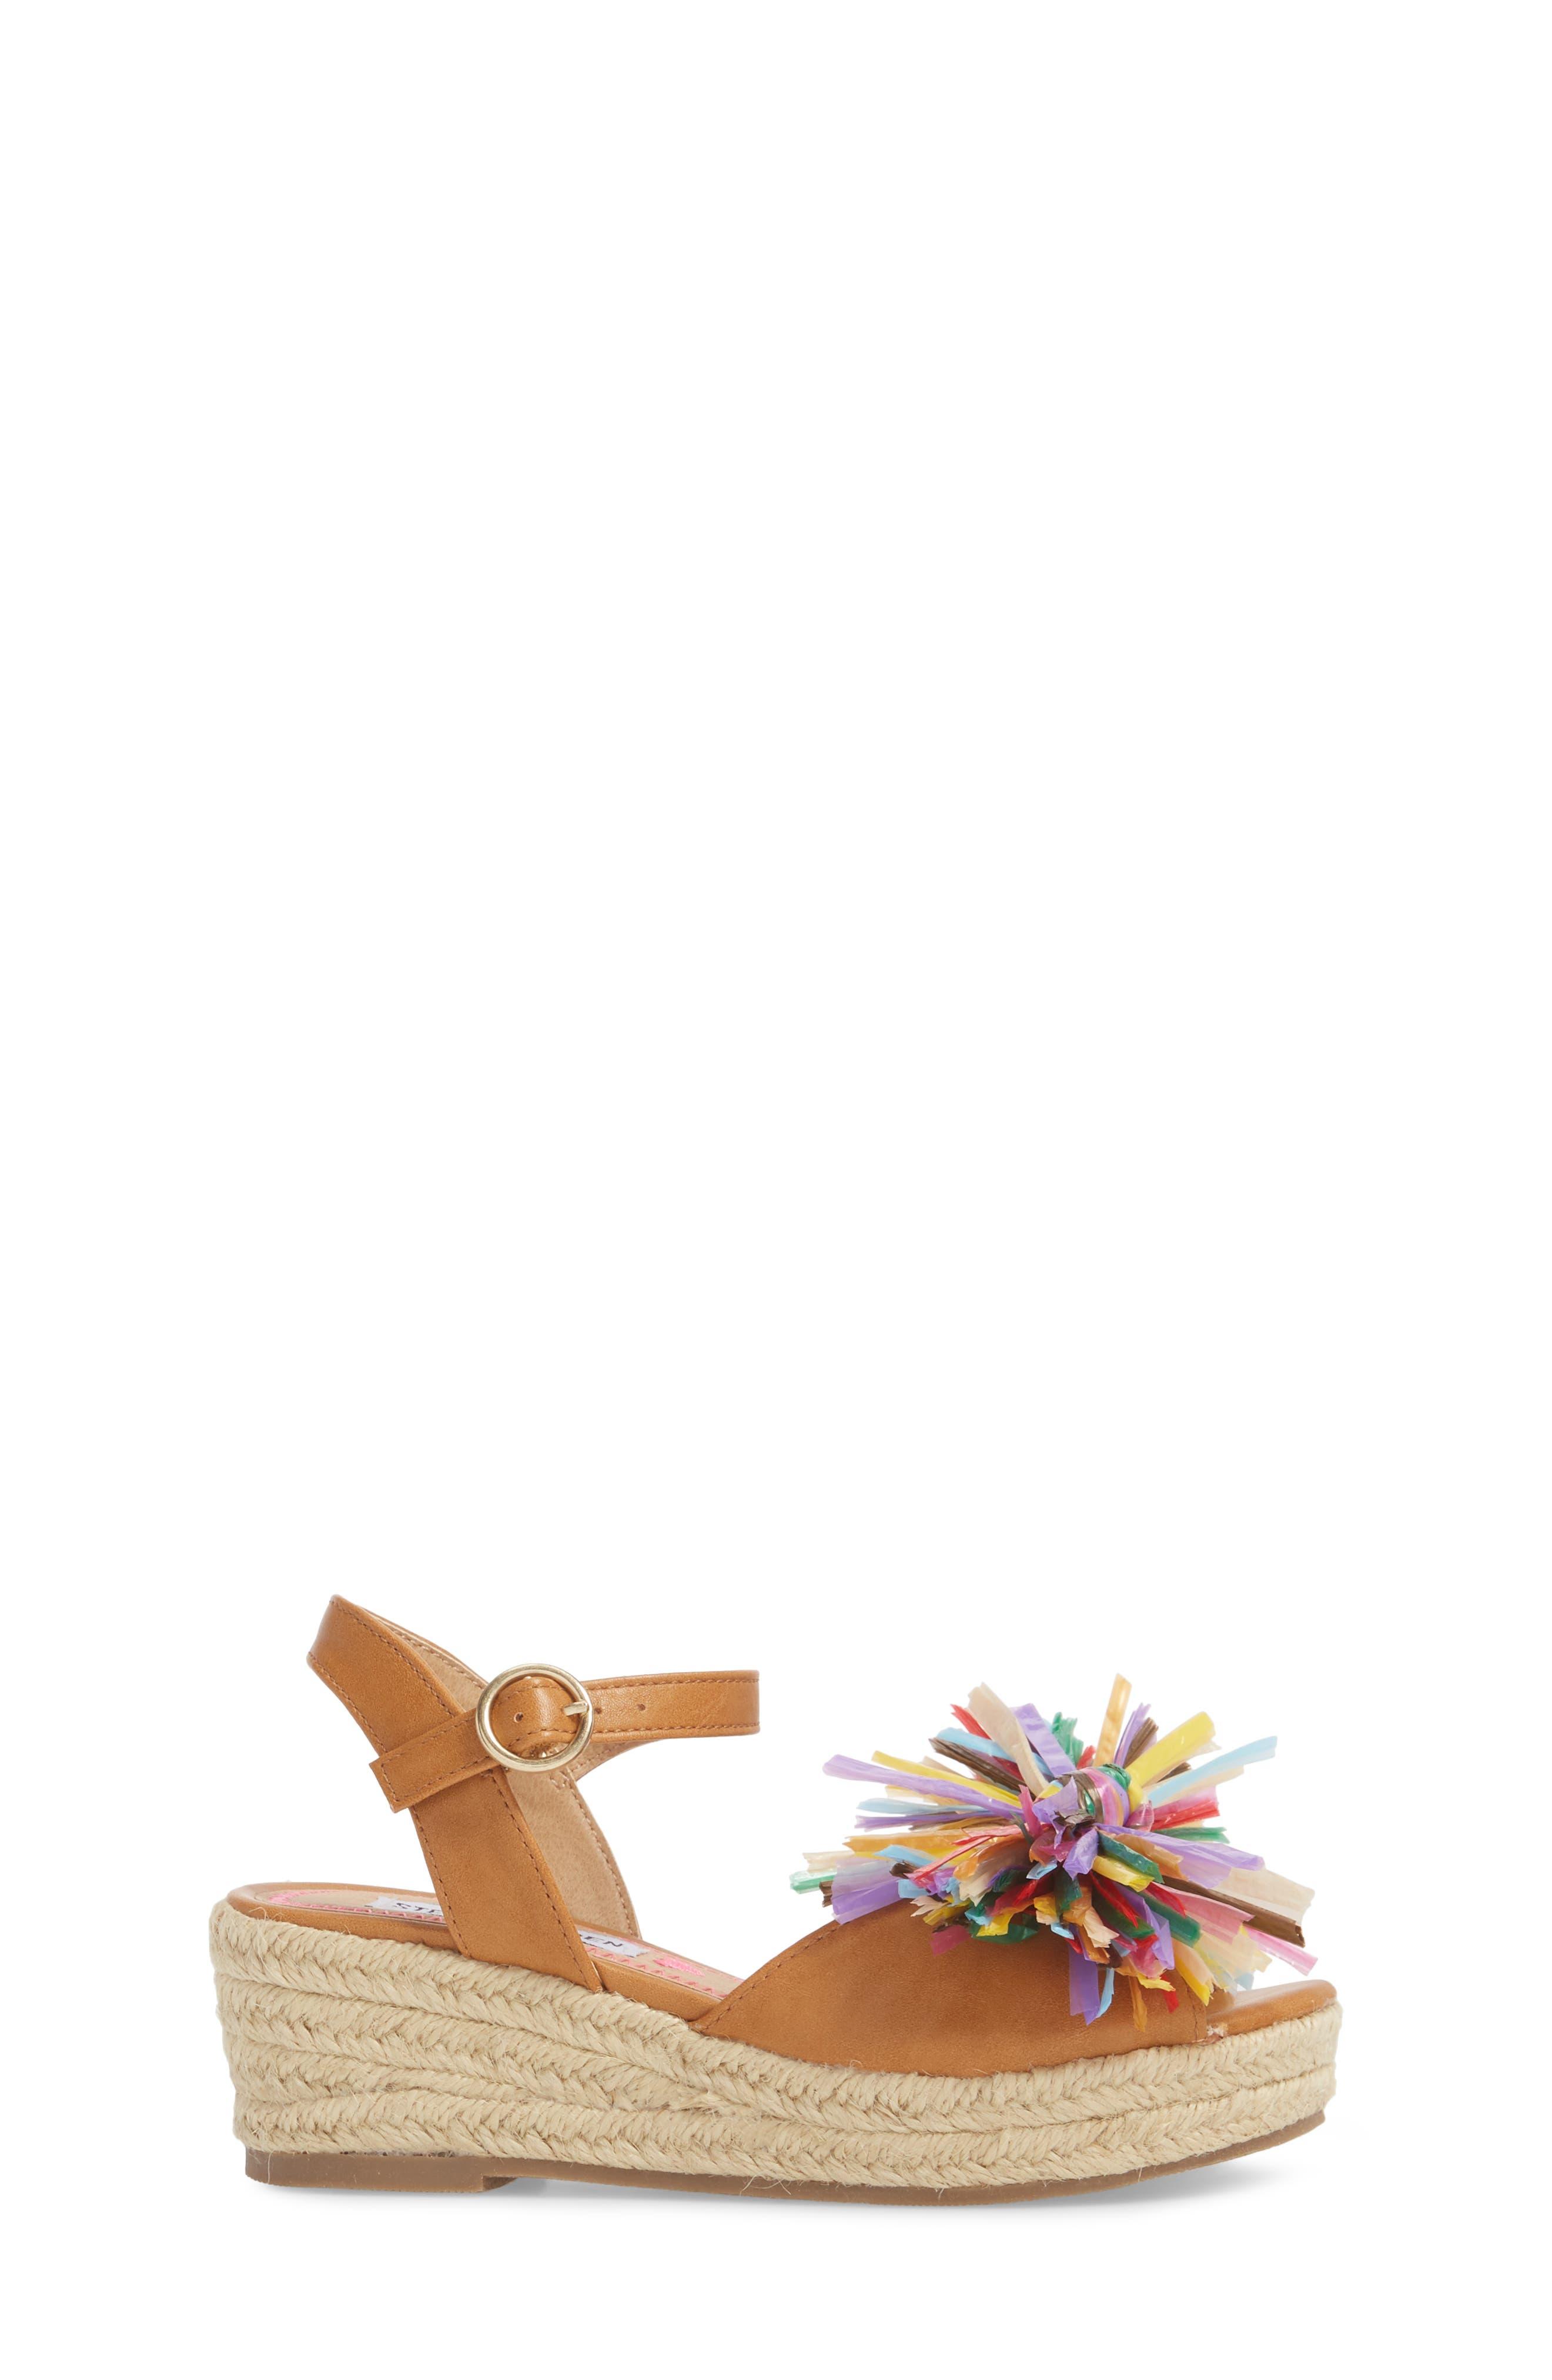 JSTRWBERI Wedge Sandal,                             Alternate thumbnail 3, color,                             Cognac Multi